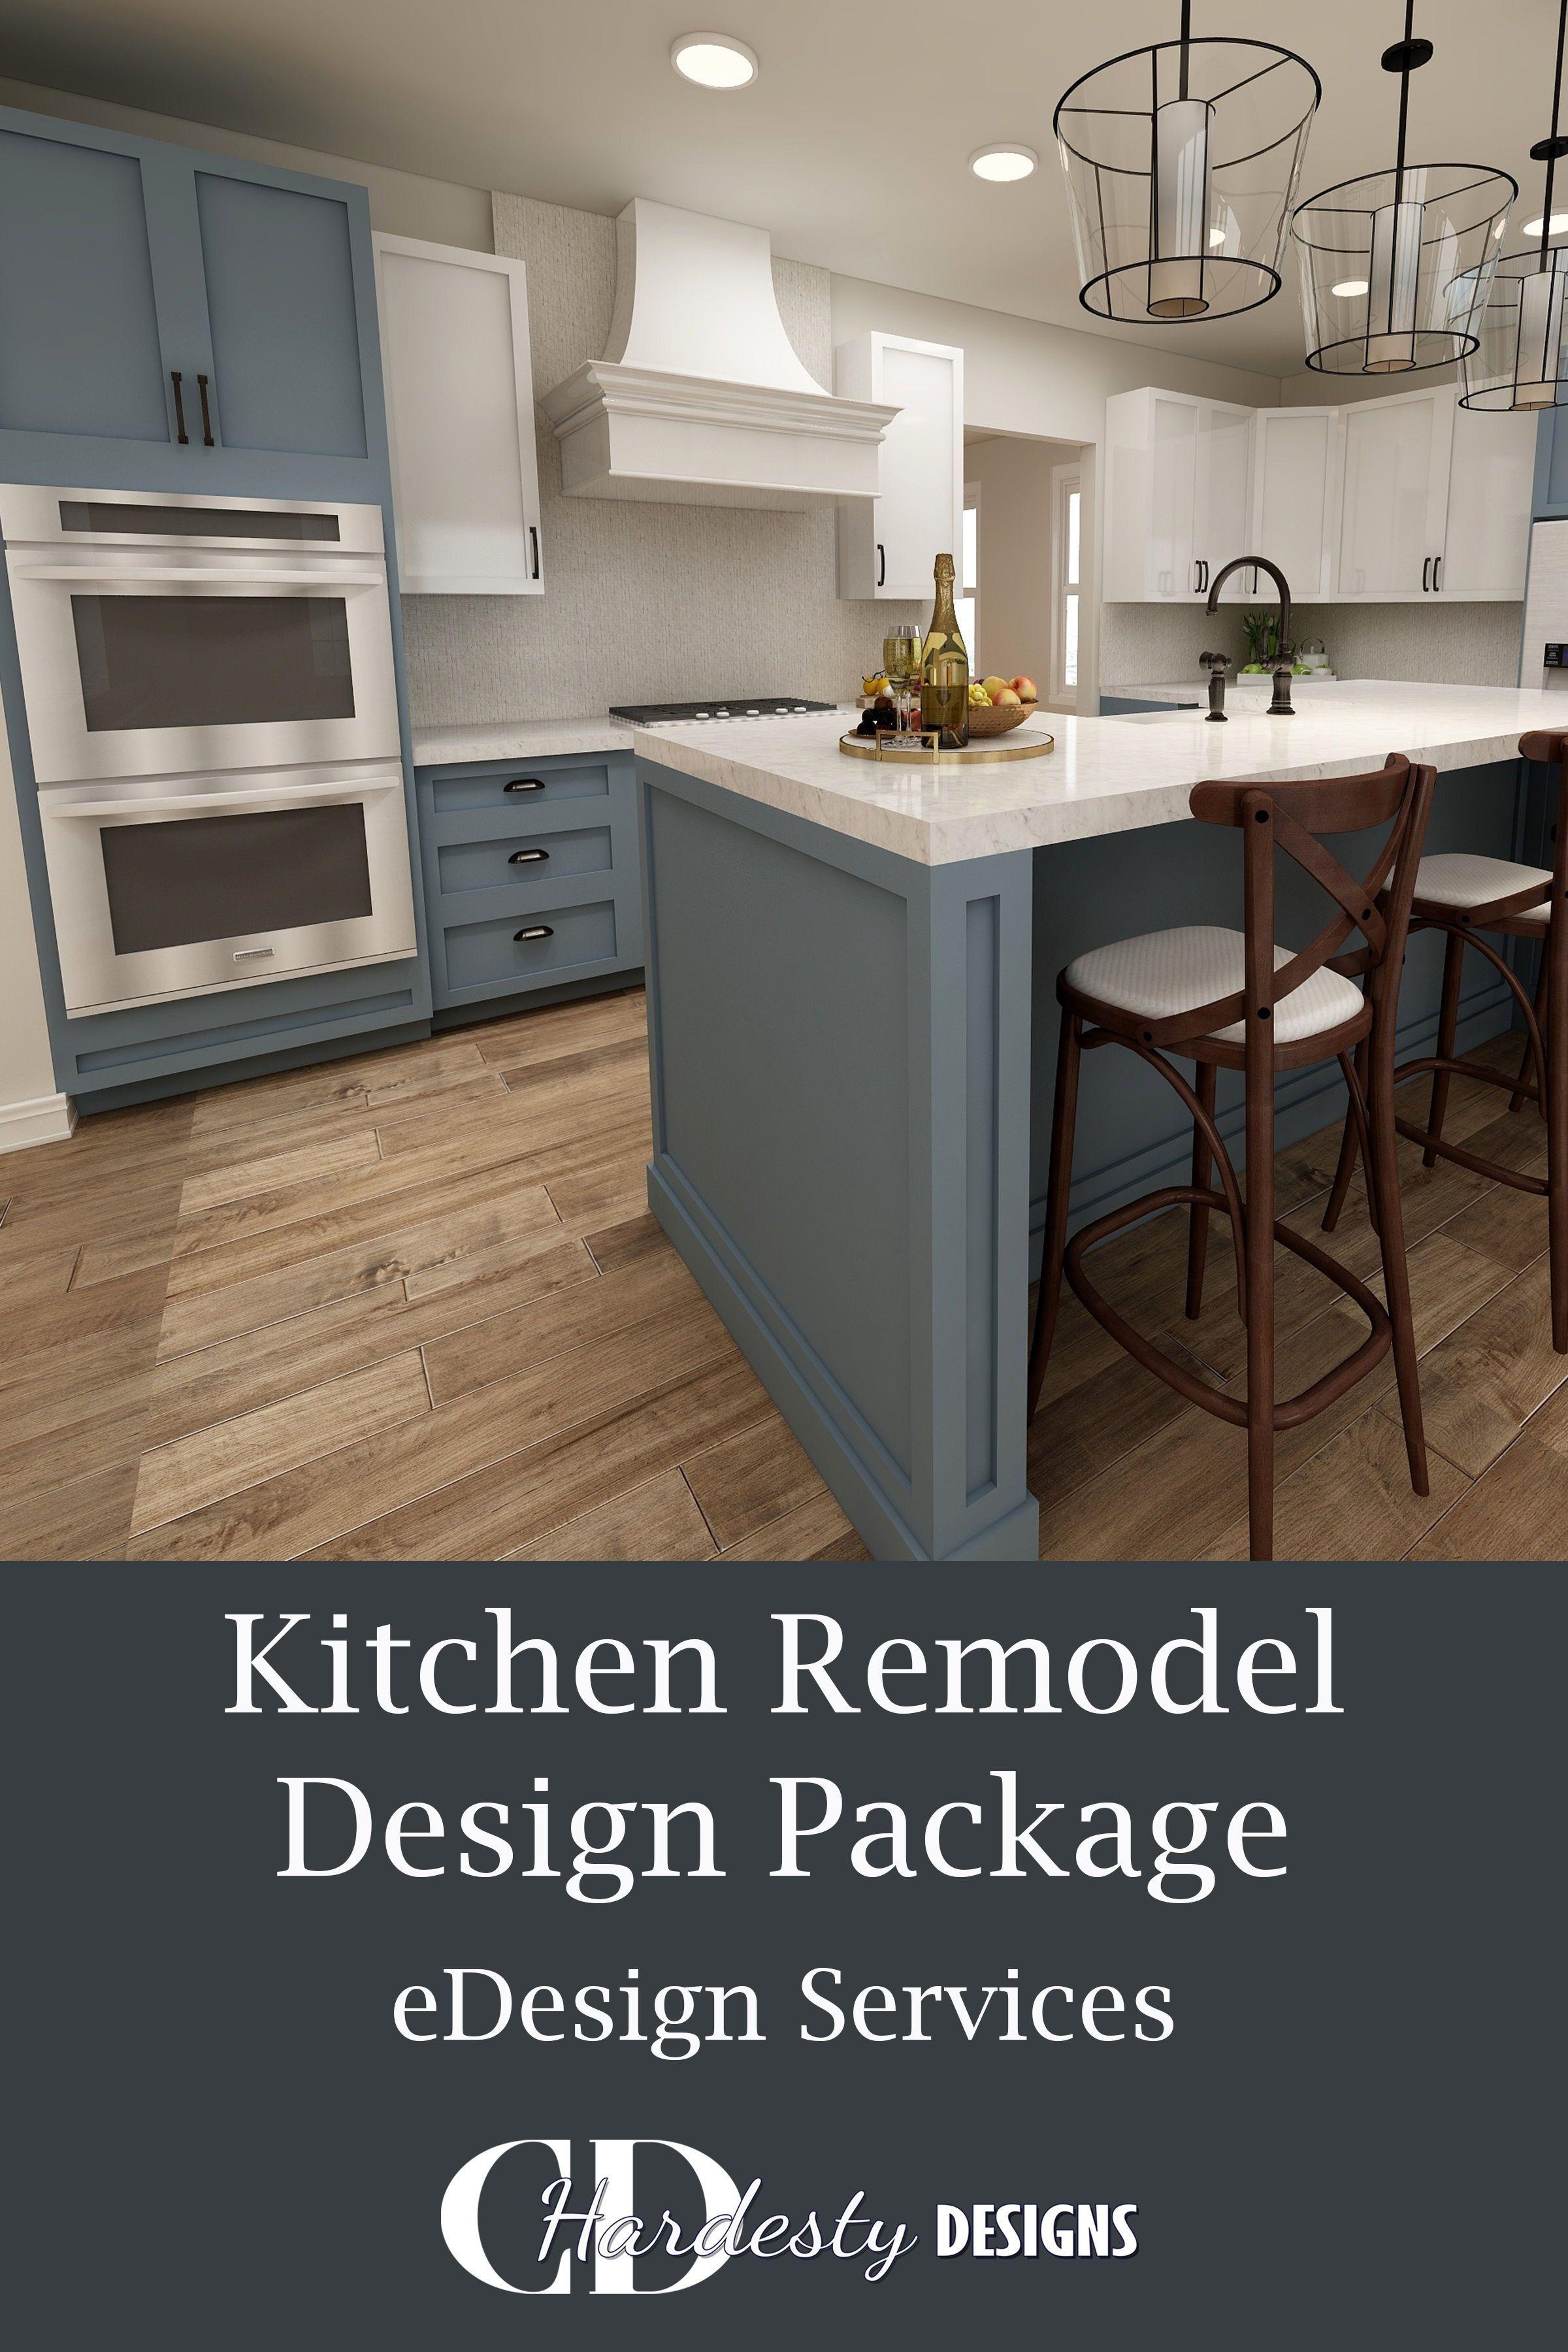 Kitchen Remodel Kitchen Remodel Design Kitchen Design Kitchen Remodel